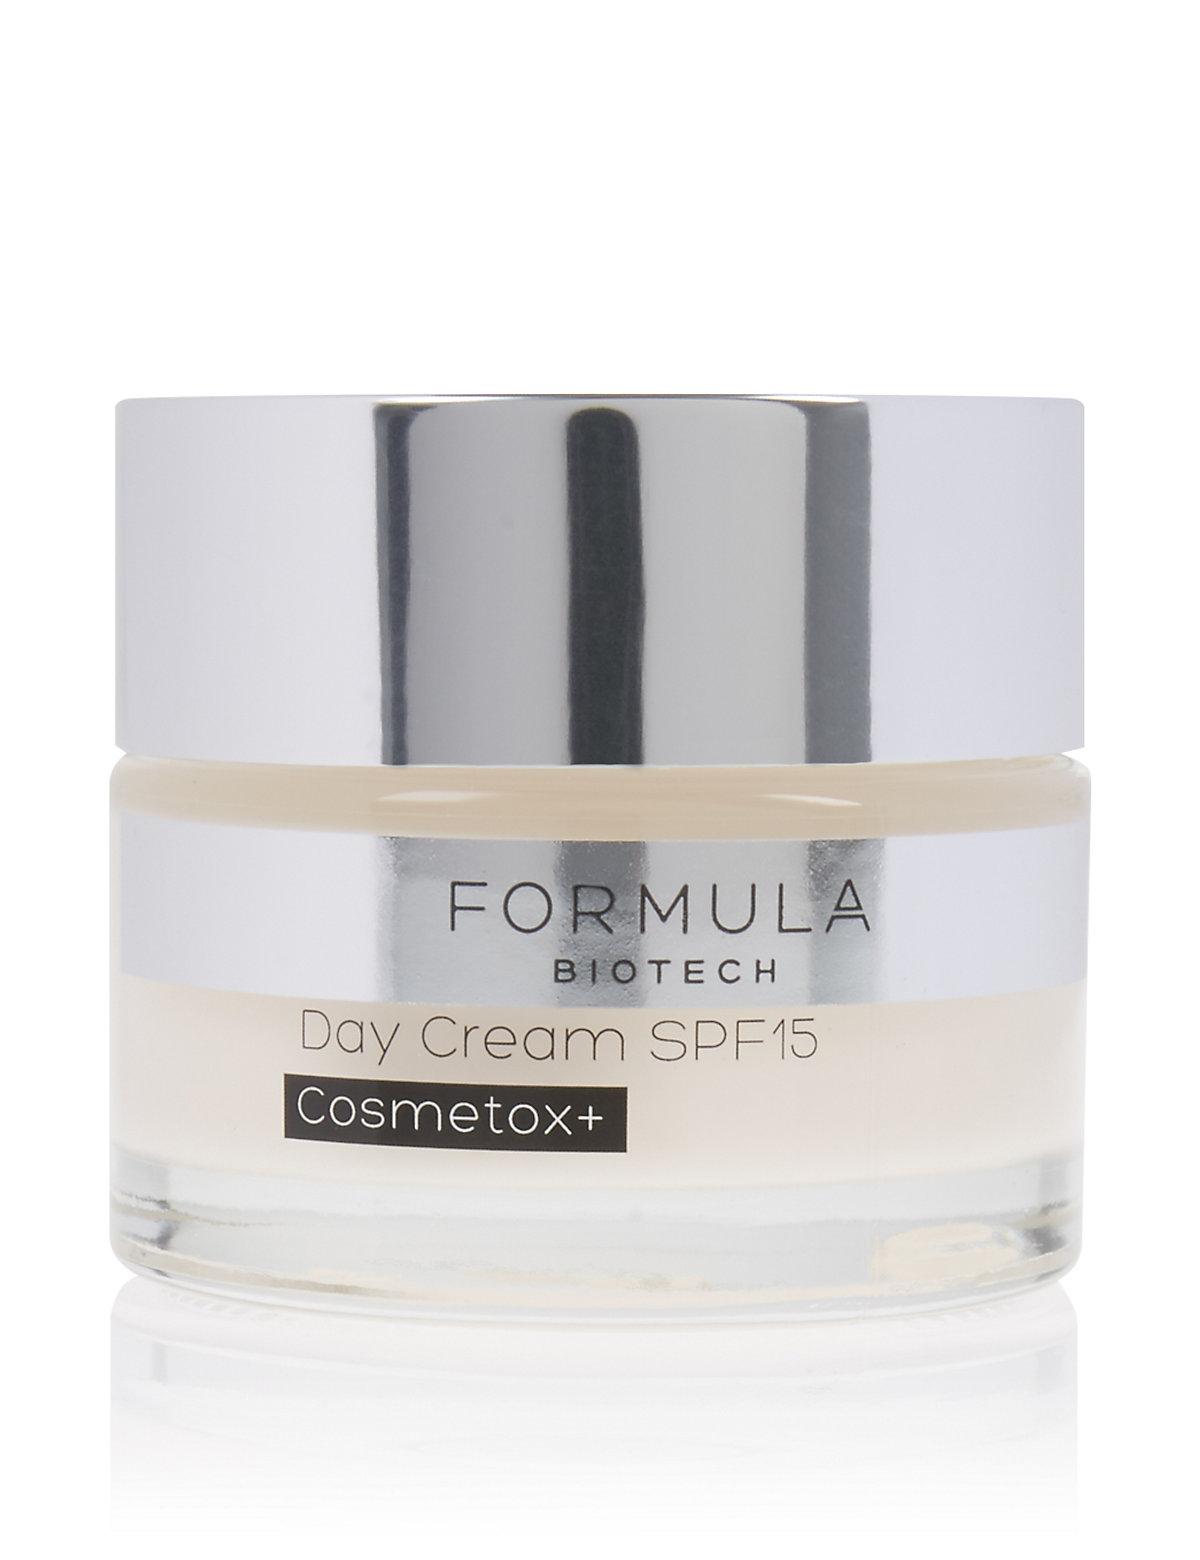 Formula Formula Biotech Day Cream SPF 15 Cosmetox 50 ml